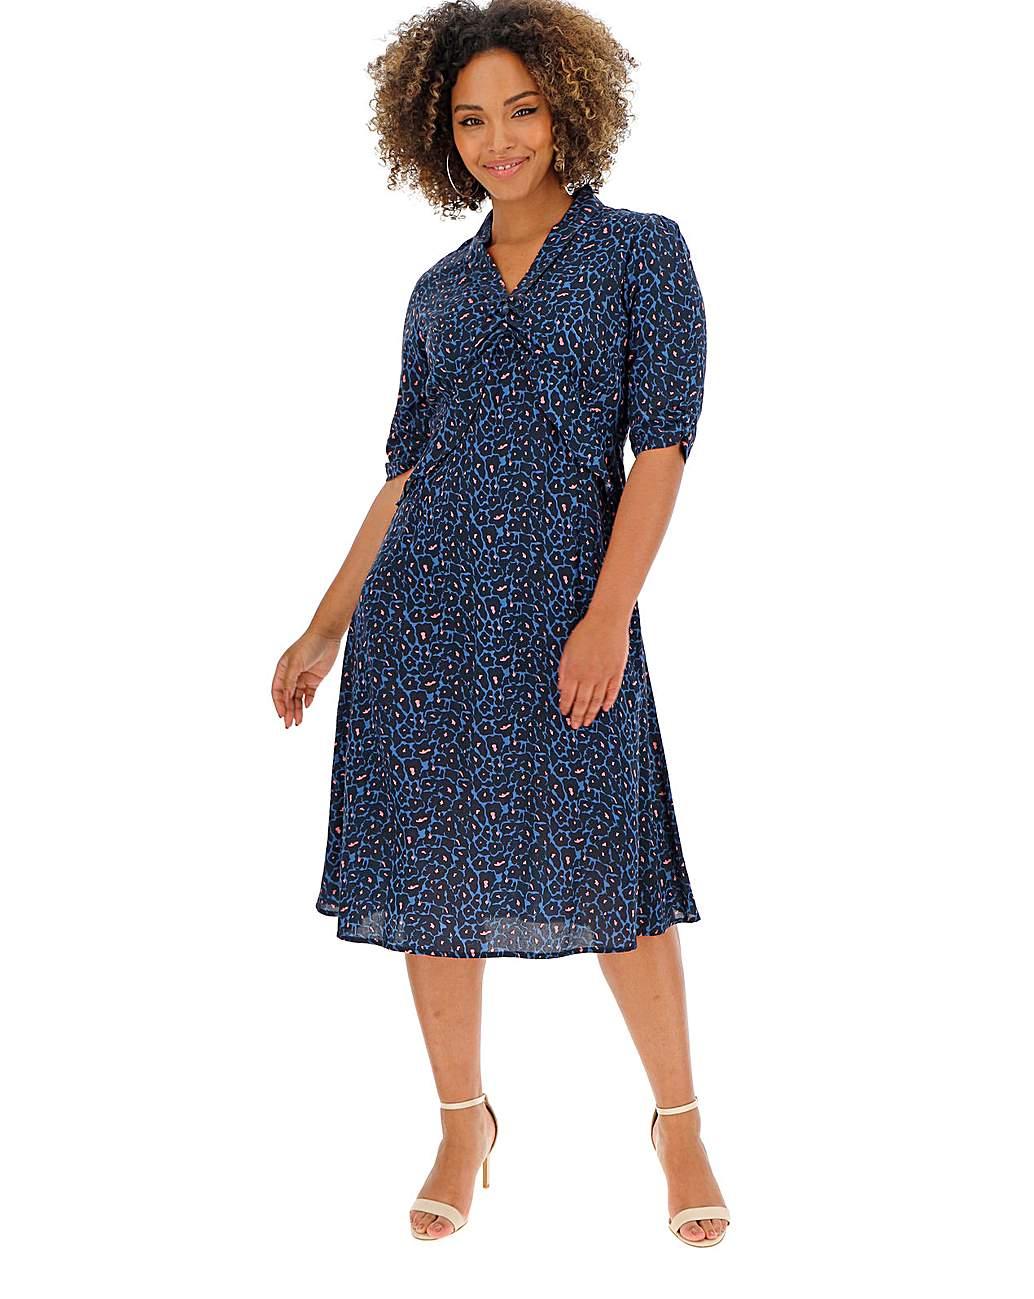 Joe Browns Womens Animal Style Print Vintage Collar Dress